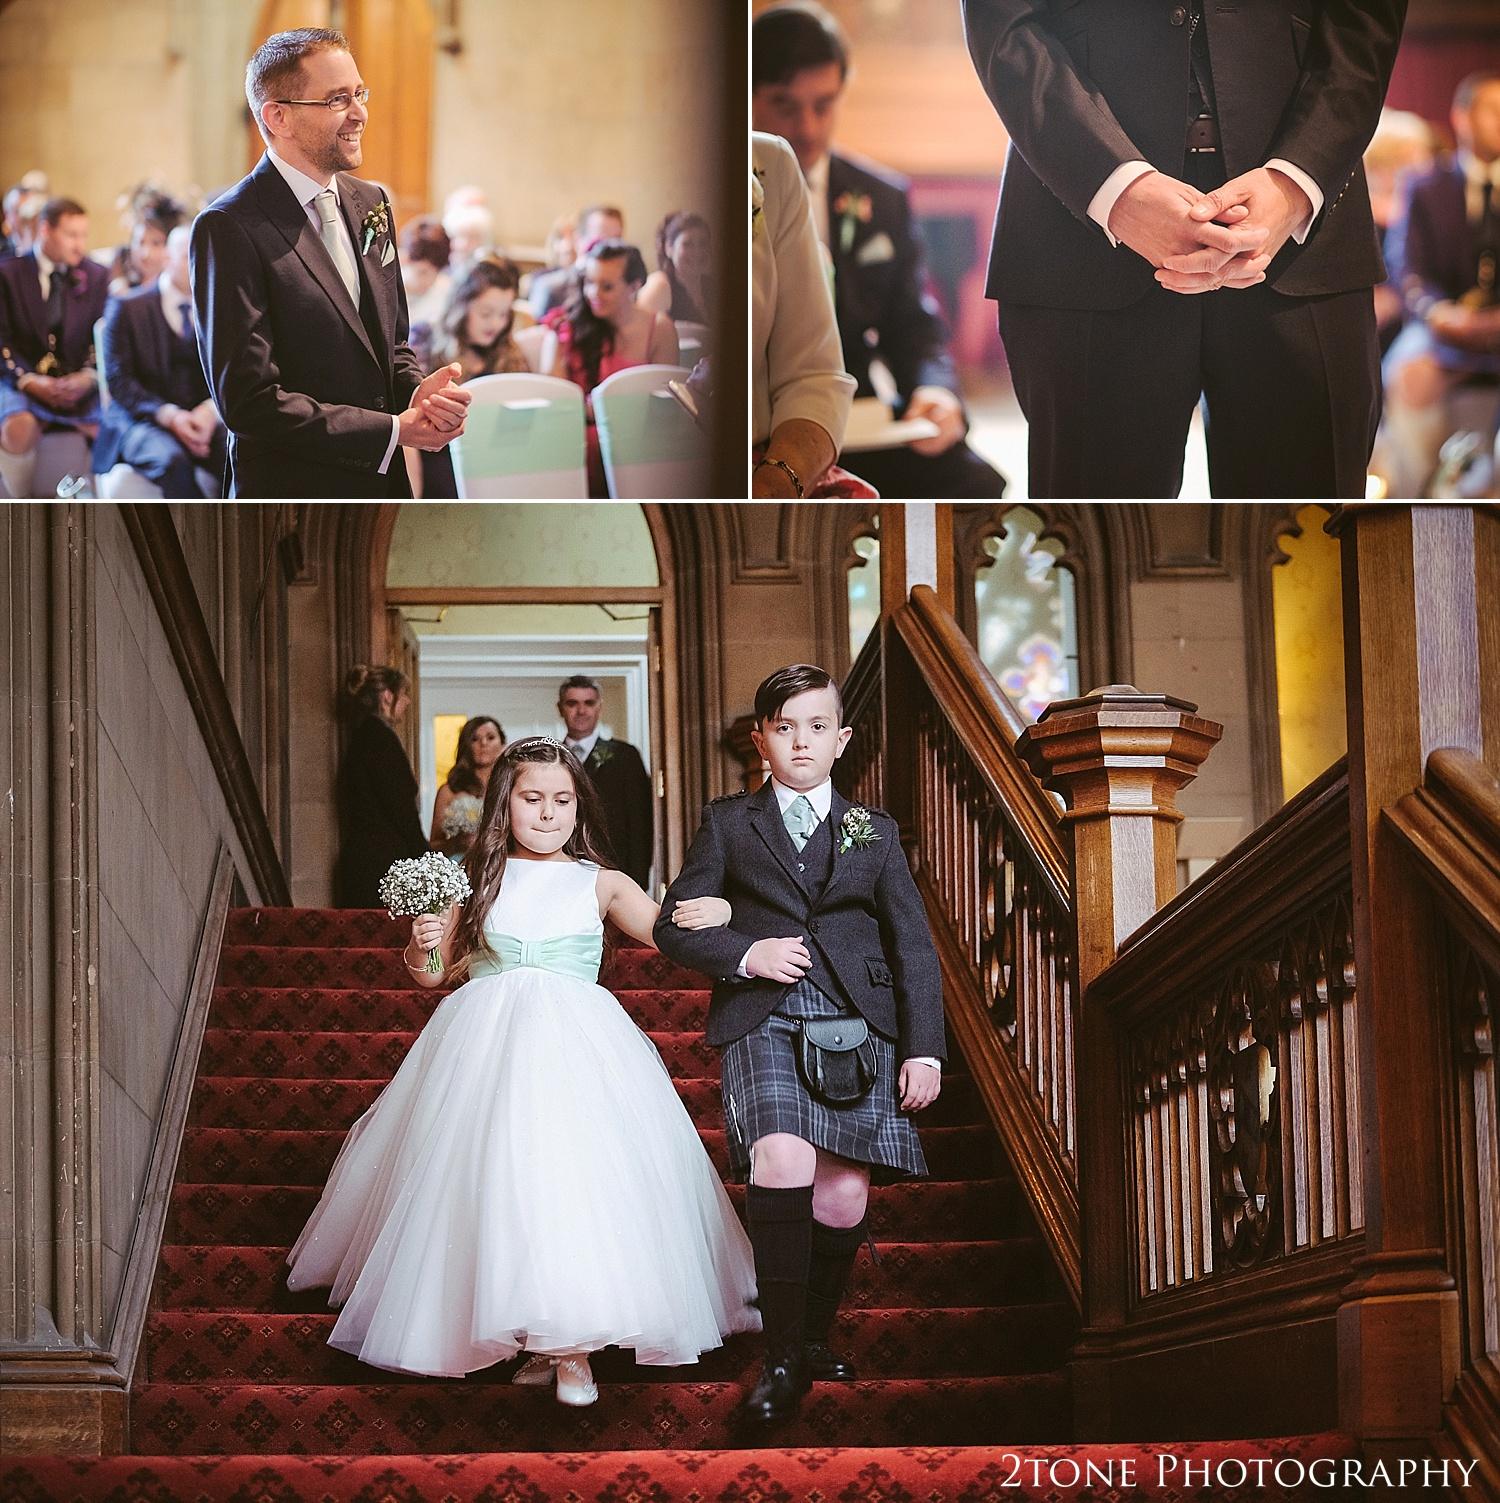 Matfen-Hall-Wedding-Photo 014.jpg